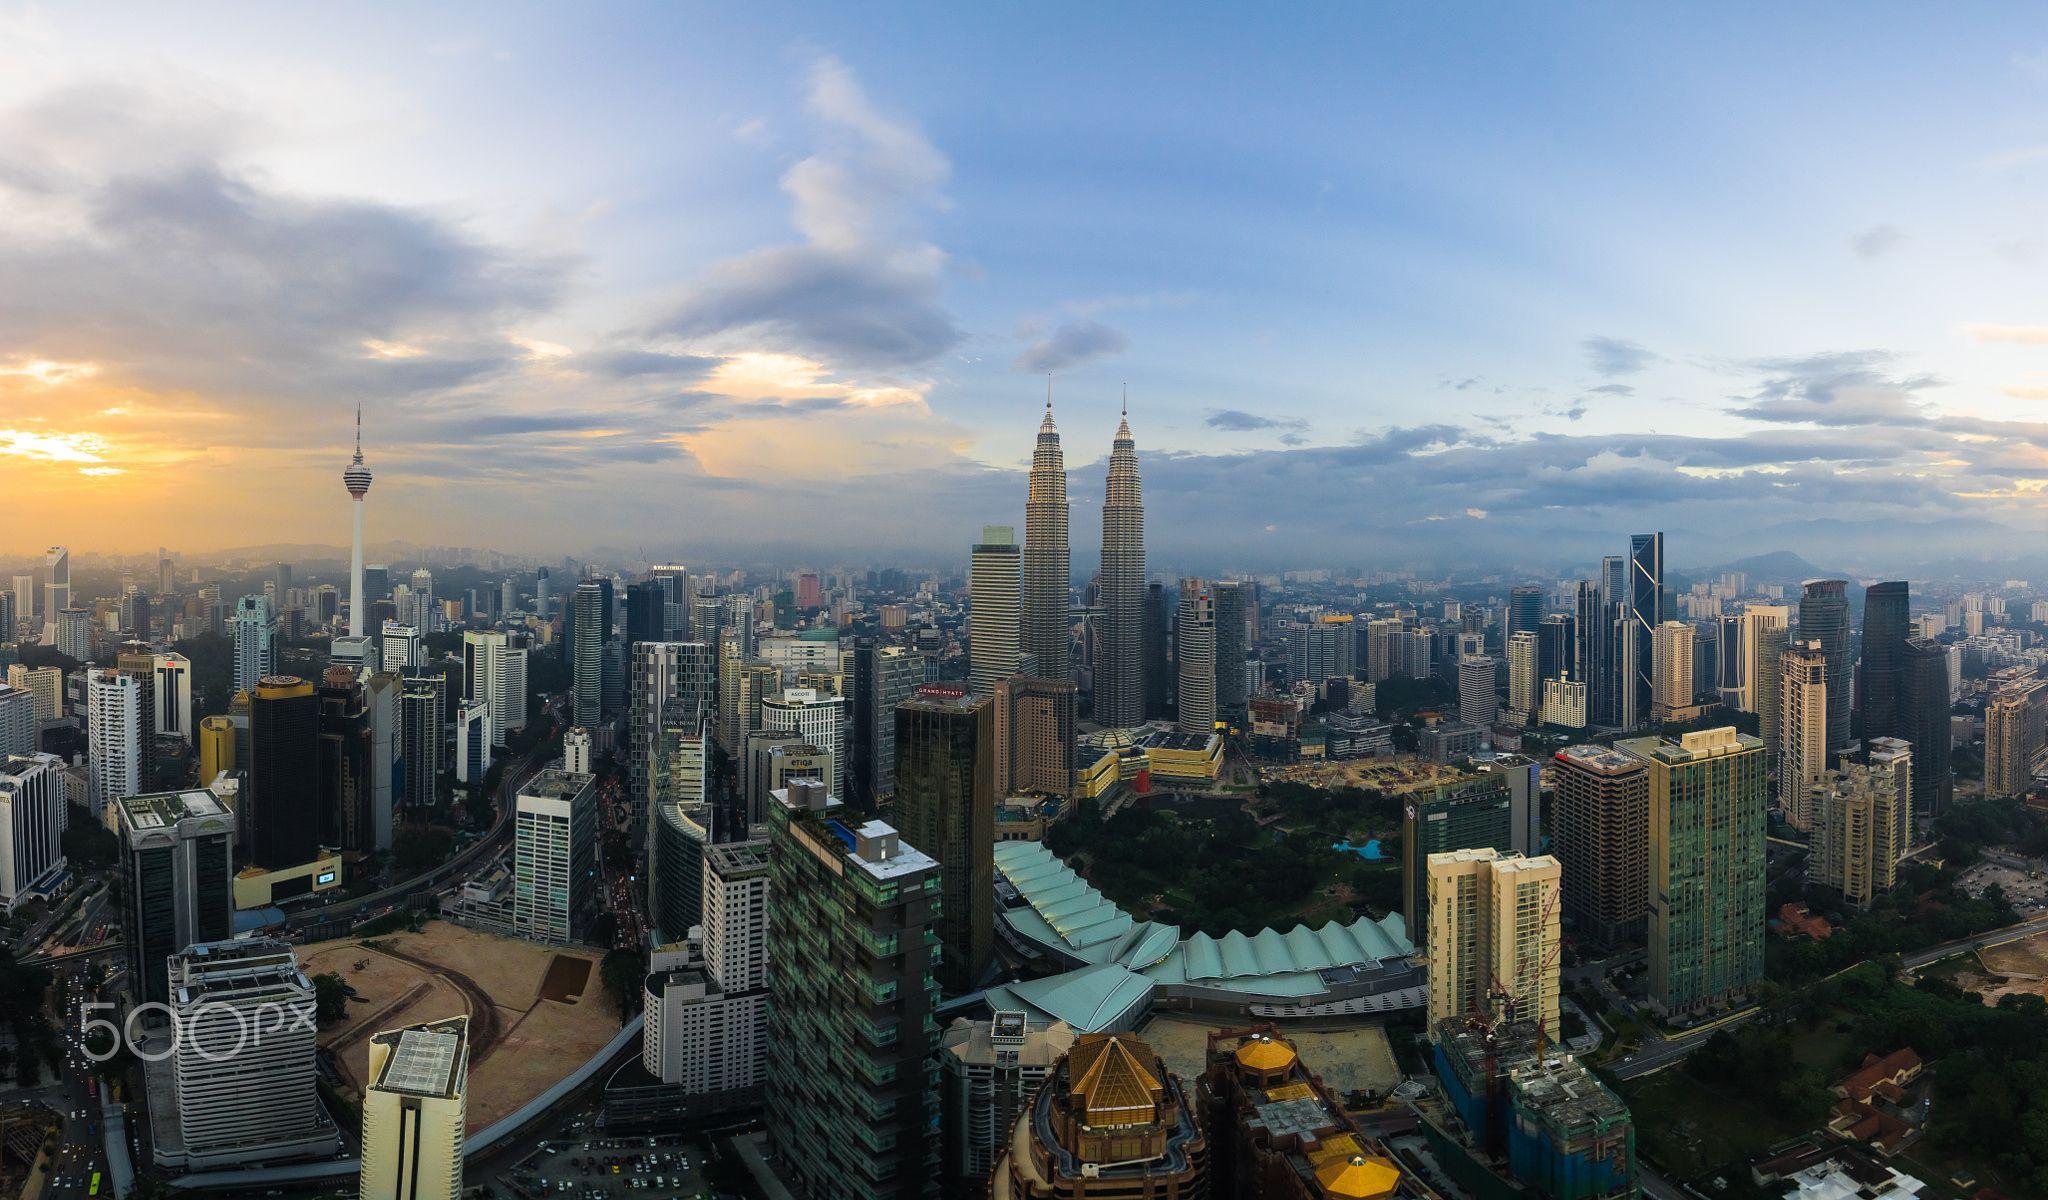 A Panorama Of A Golden City A Panorama Of Kuala Lumpur City Skyline During Sunset Golden City Kuala Lumpur City Panorama